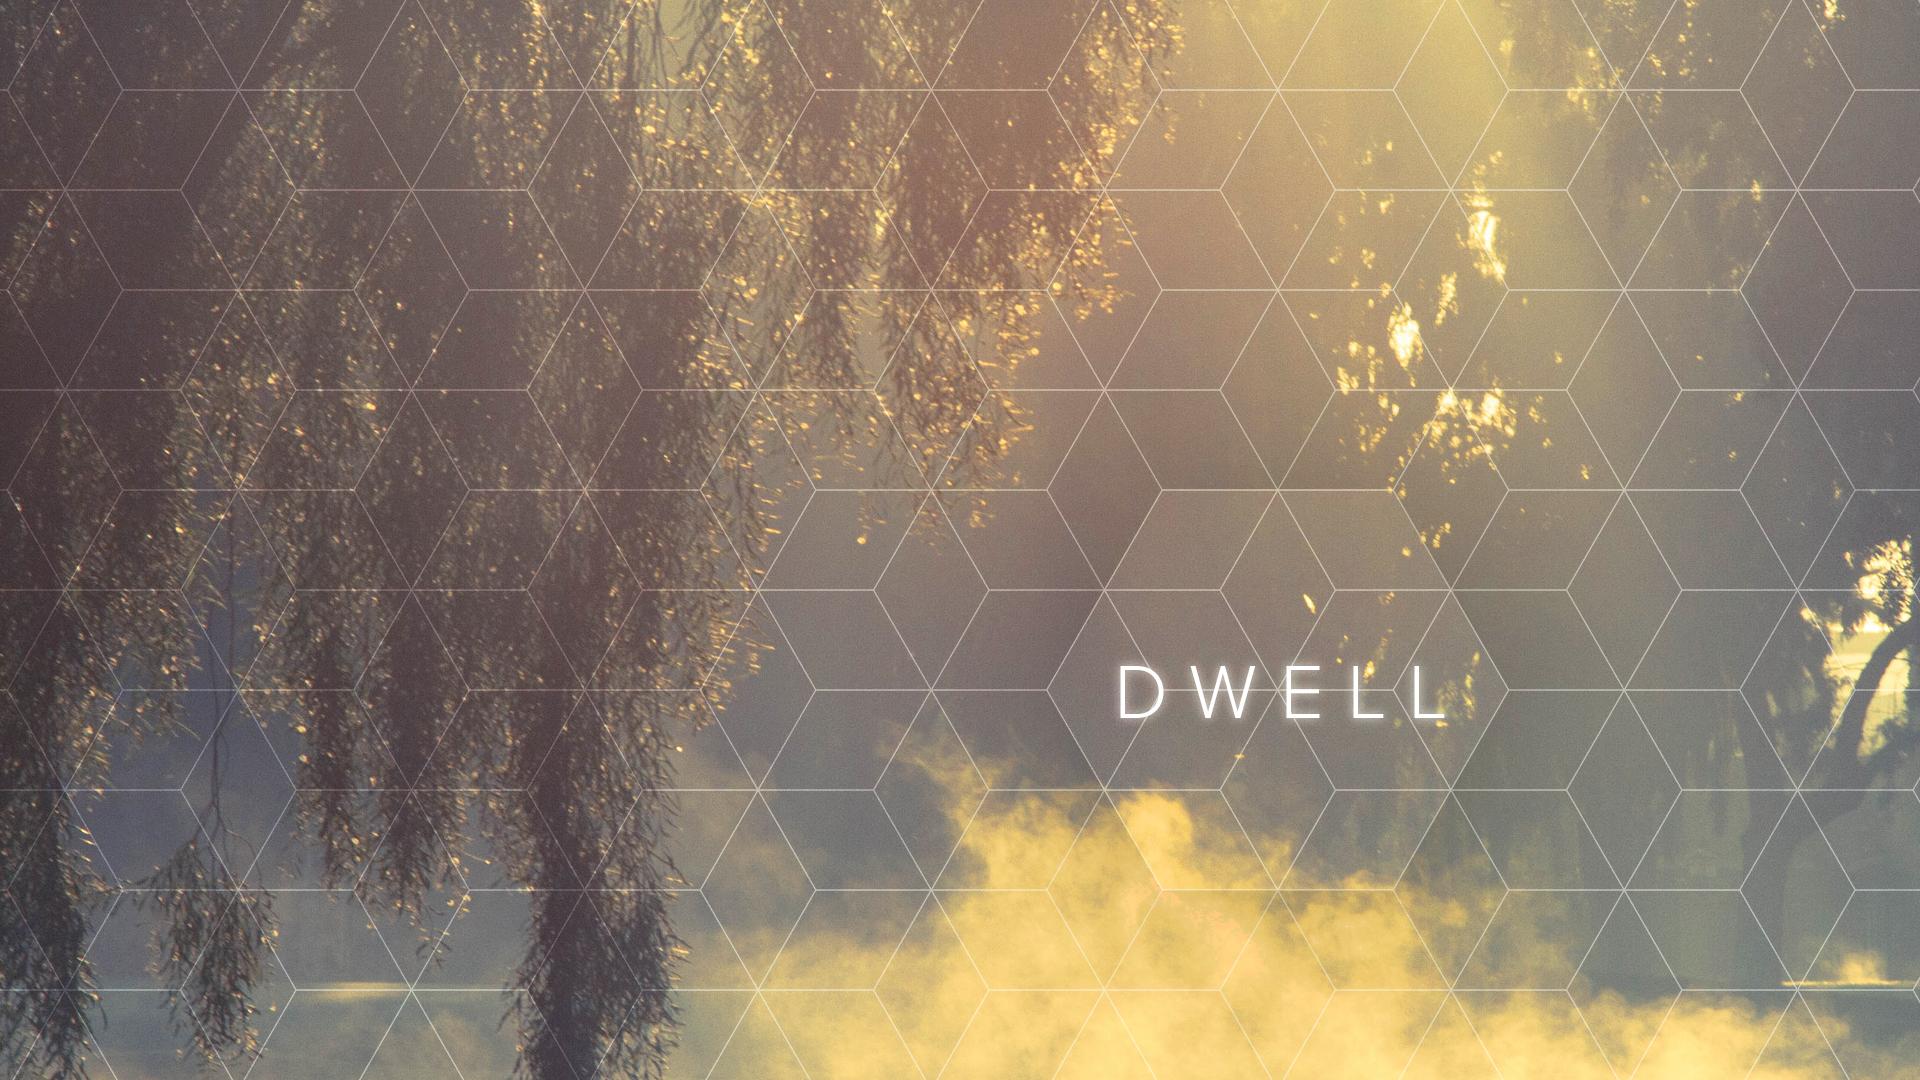 Dwell-HD.jpg